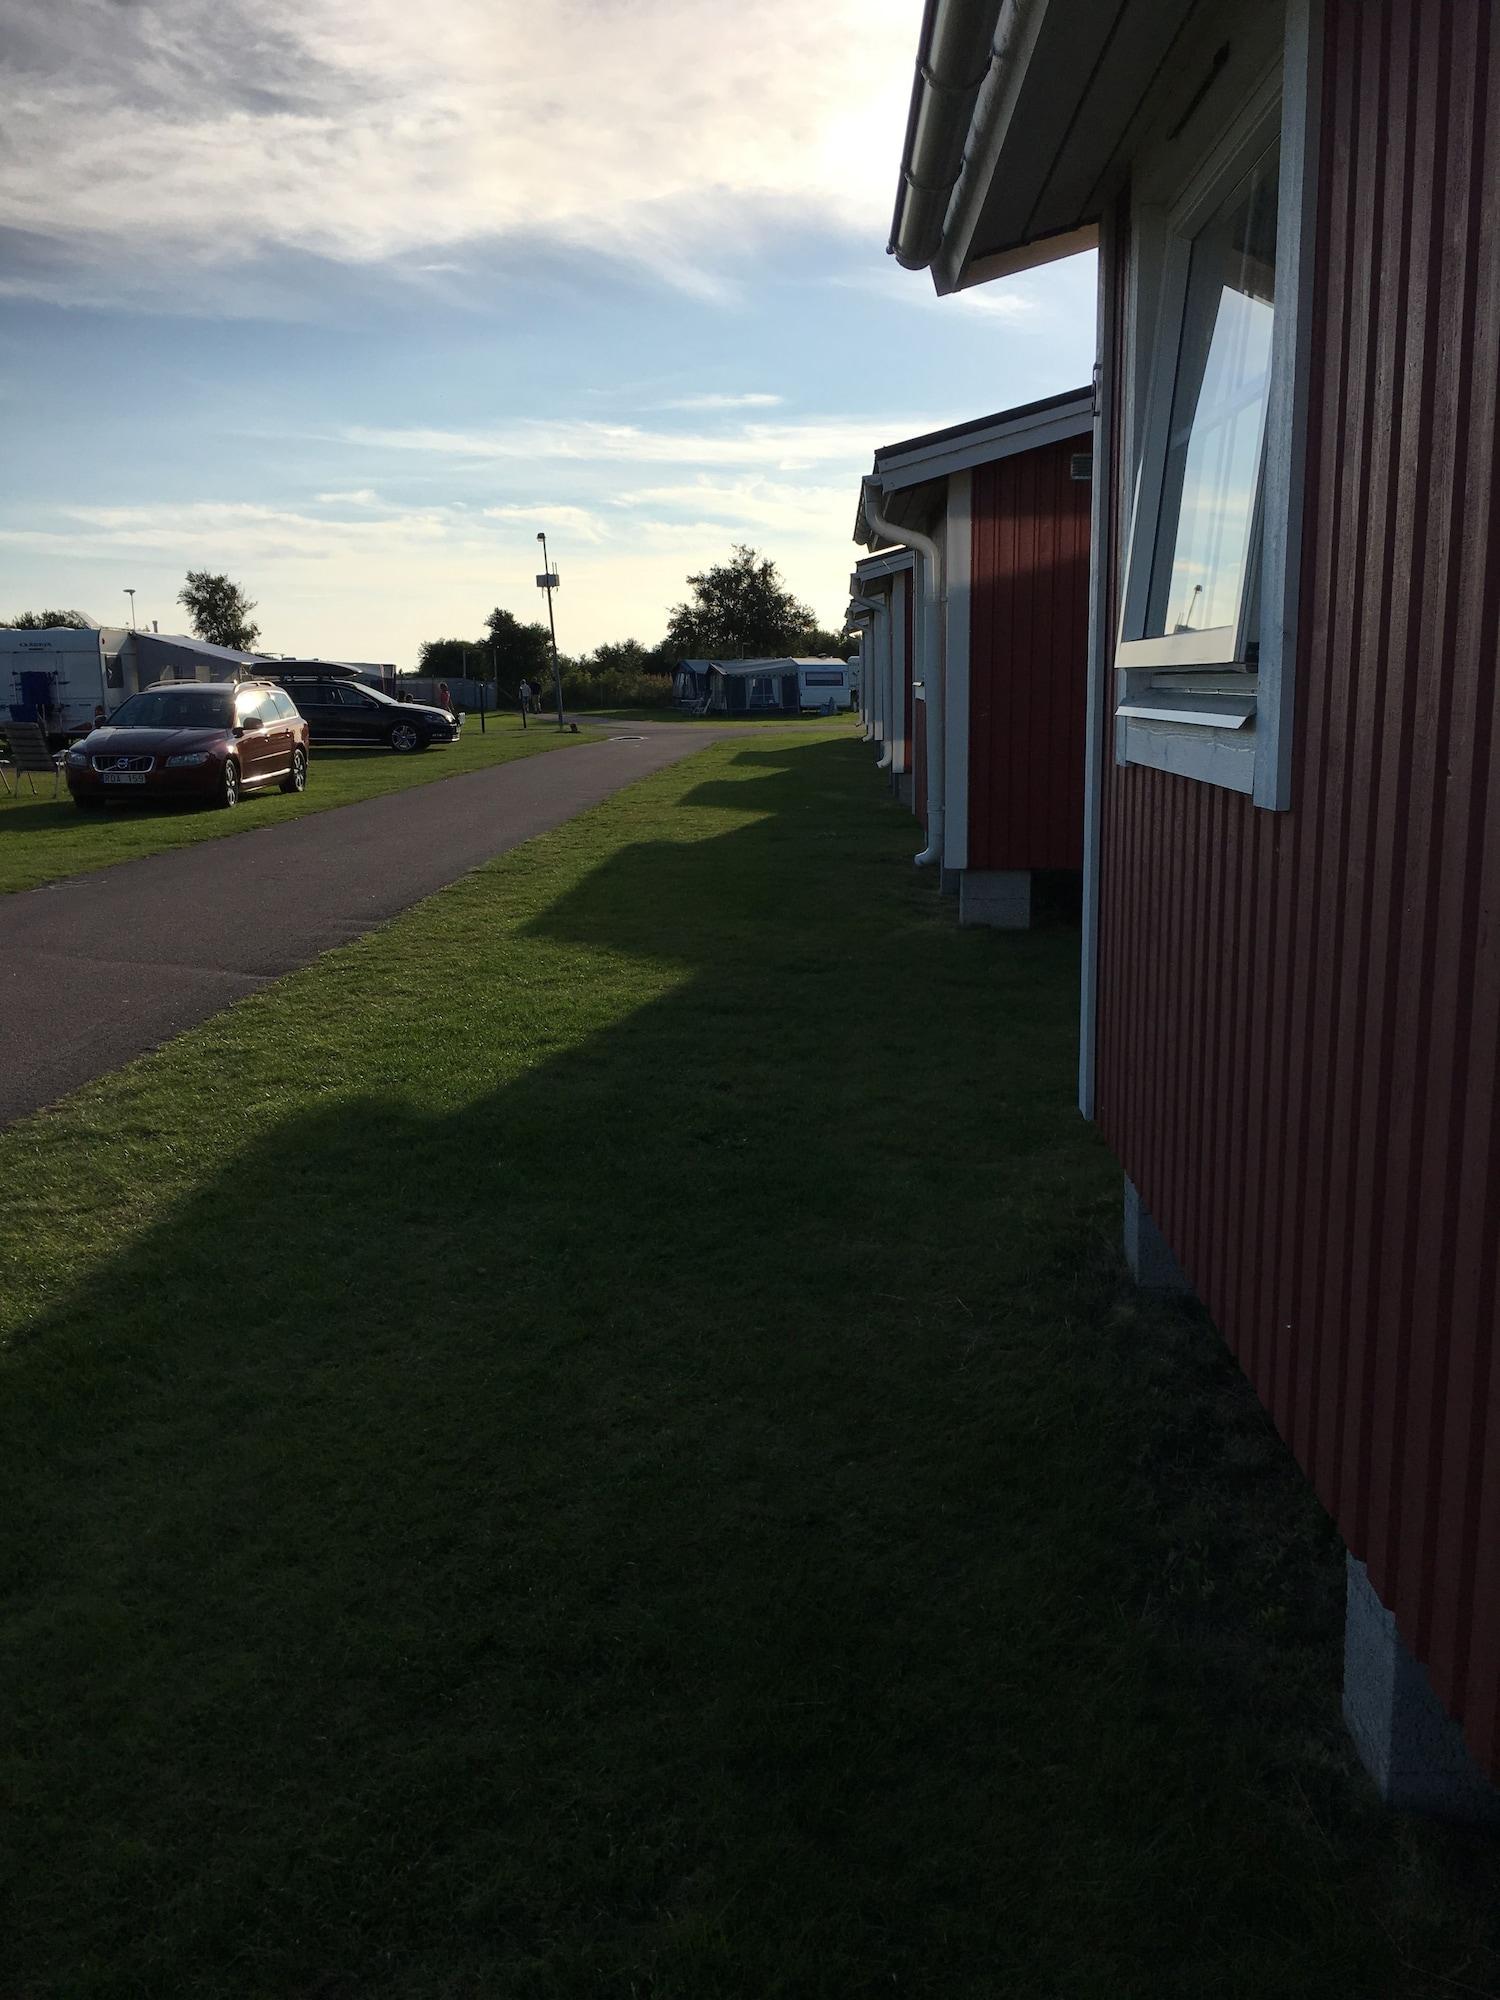 First Camp Hagön Halmstad, Halmstad